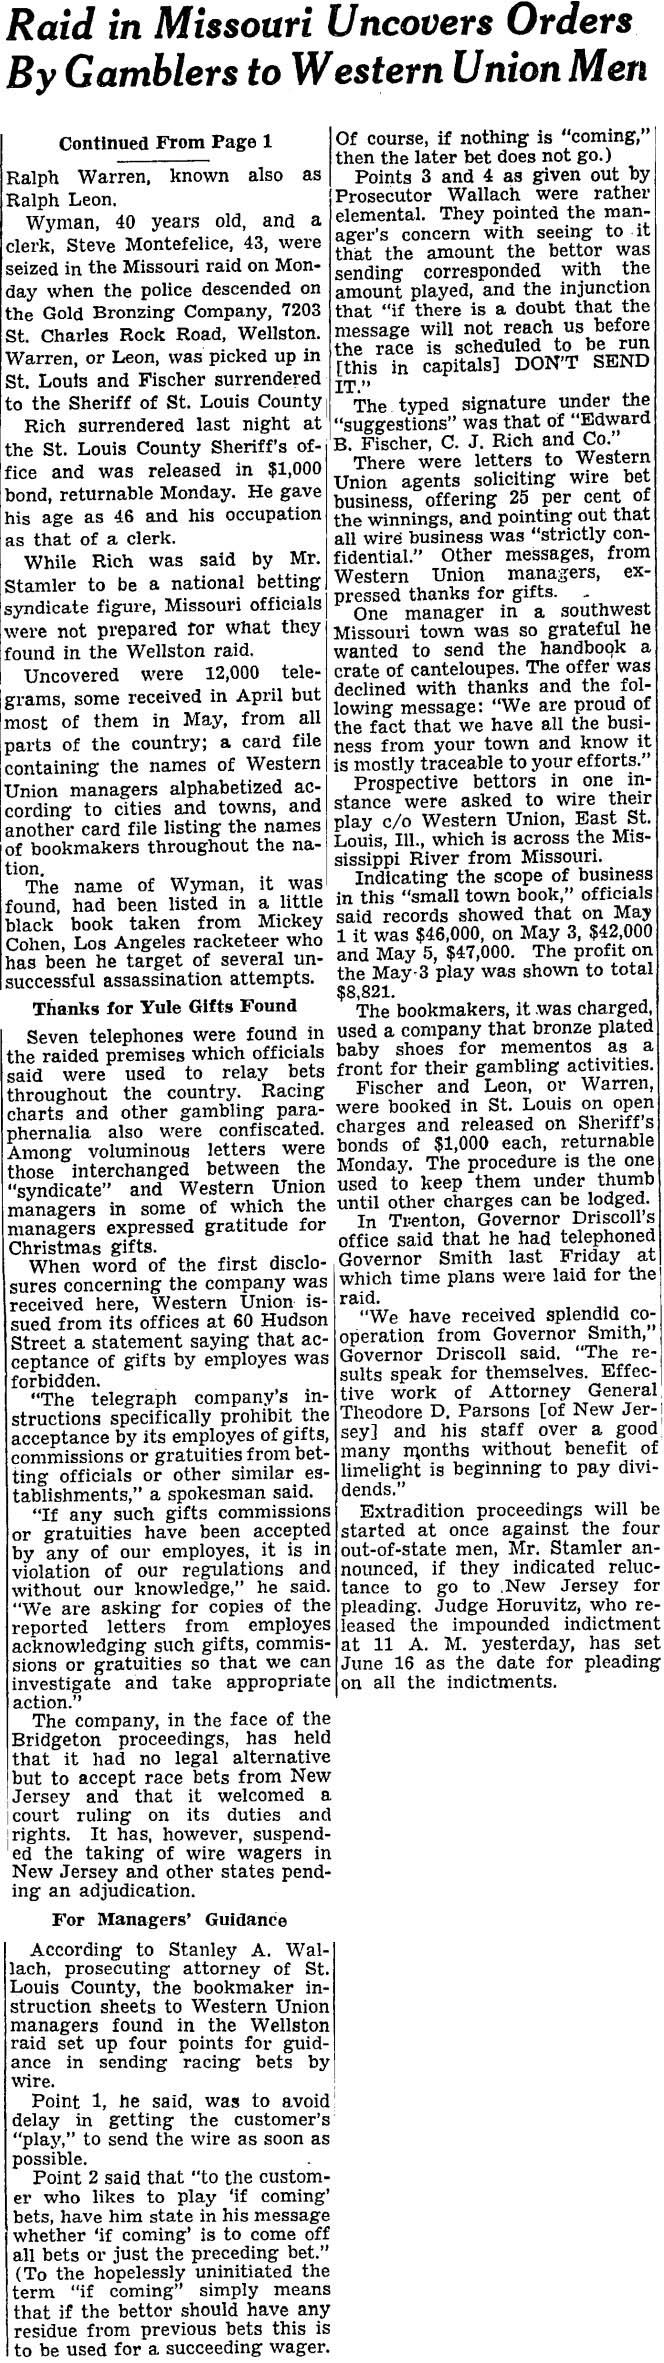 2WYMAN,NYTimes June 7, 1950